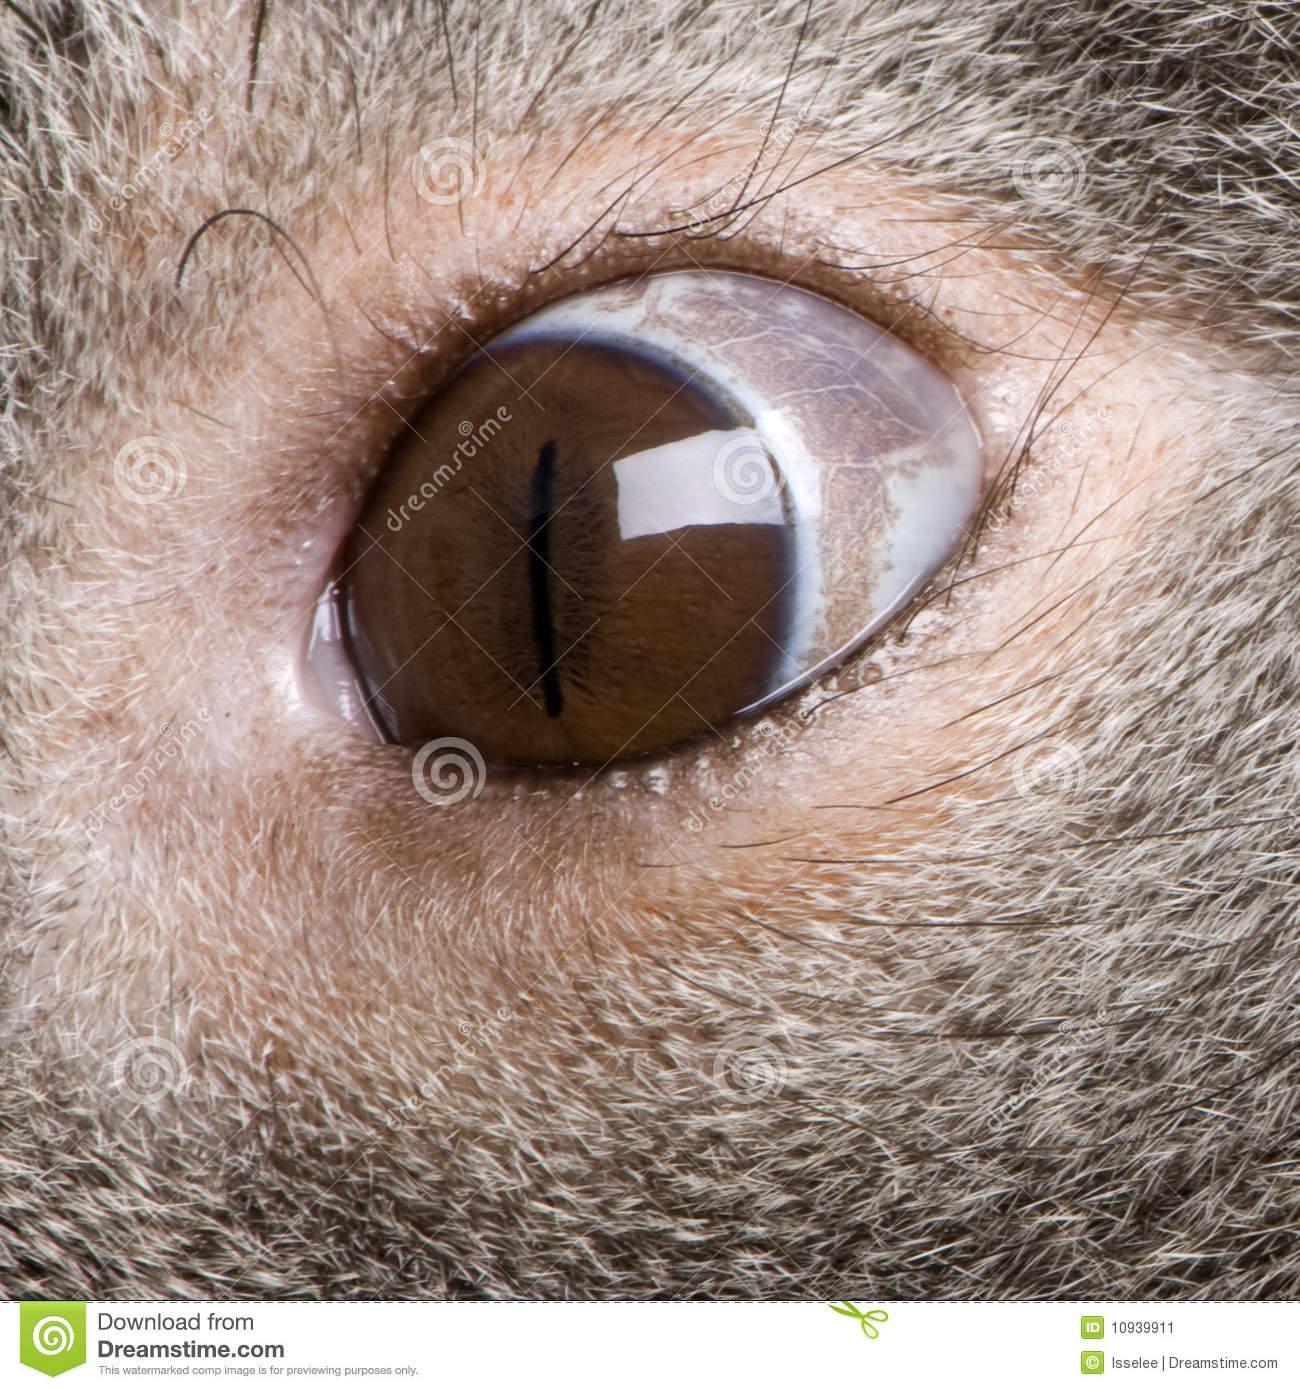 As-tu un oeil de lynx ? 6